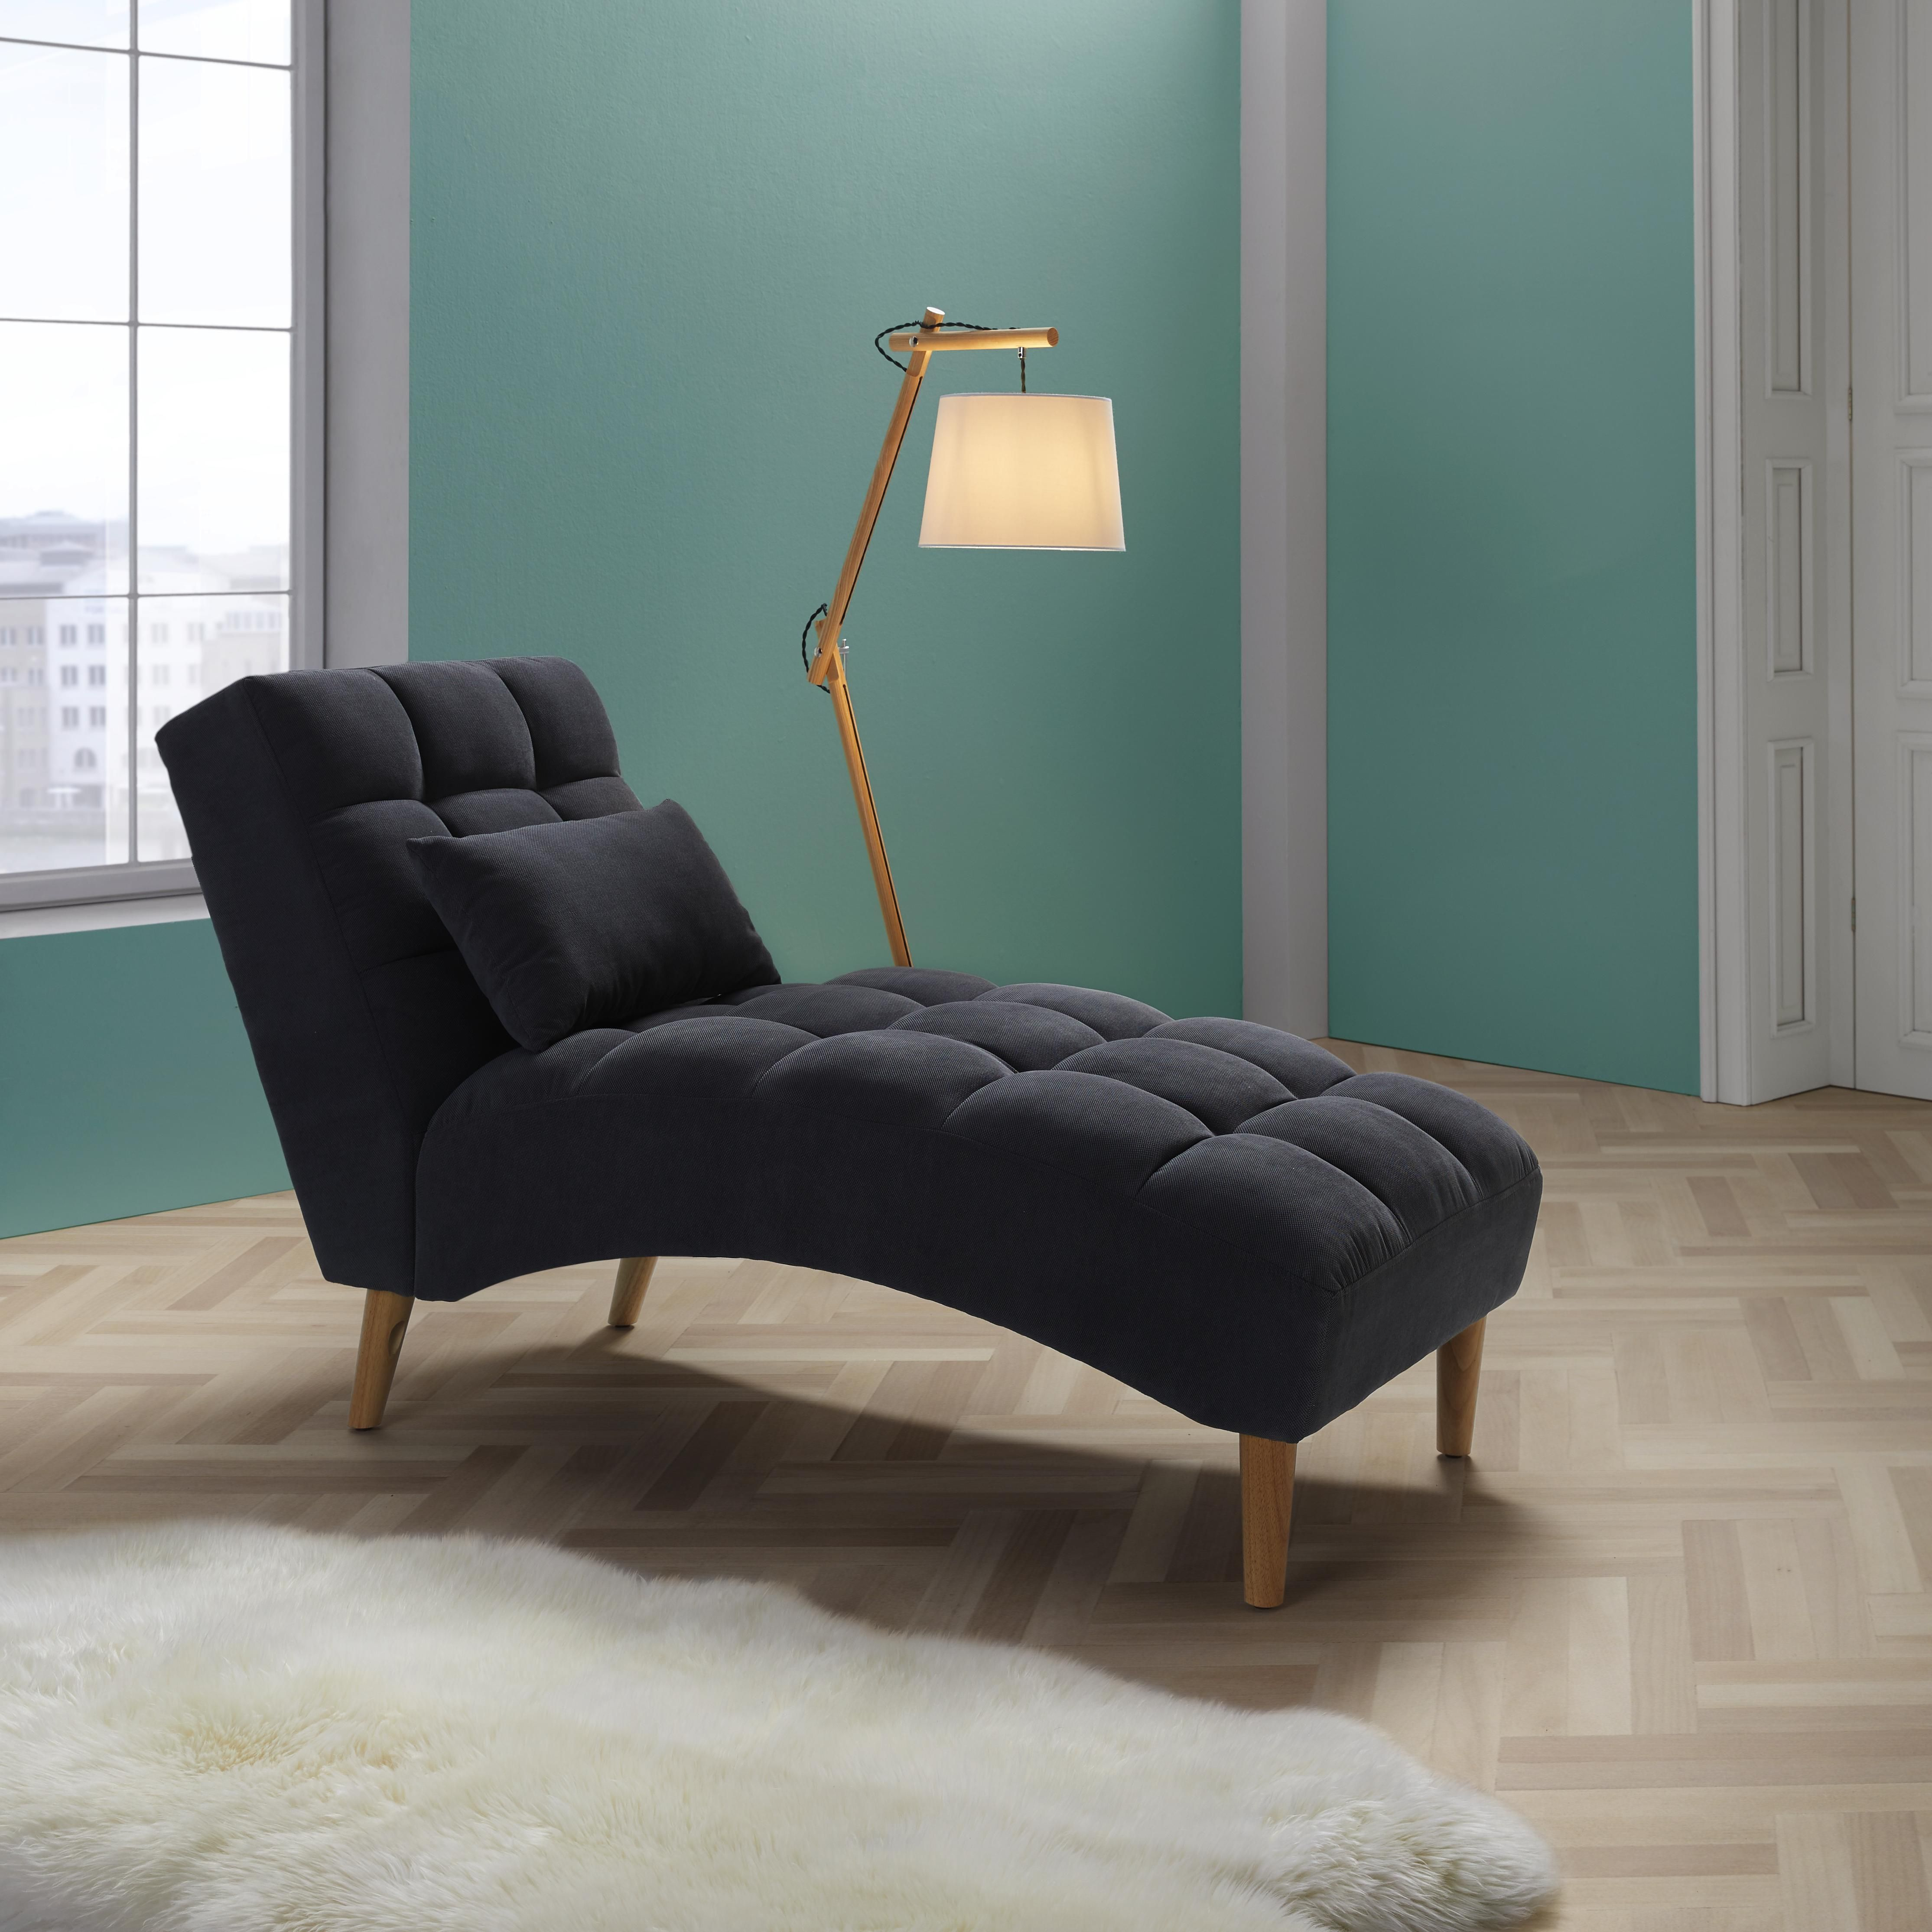 Recamiere Darian Moderne Couch Wohnung Design Couch